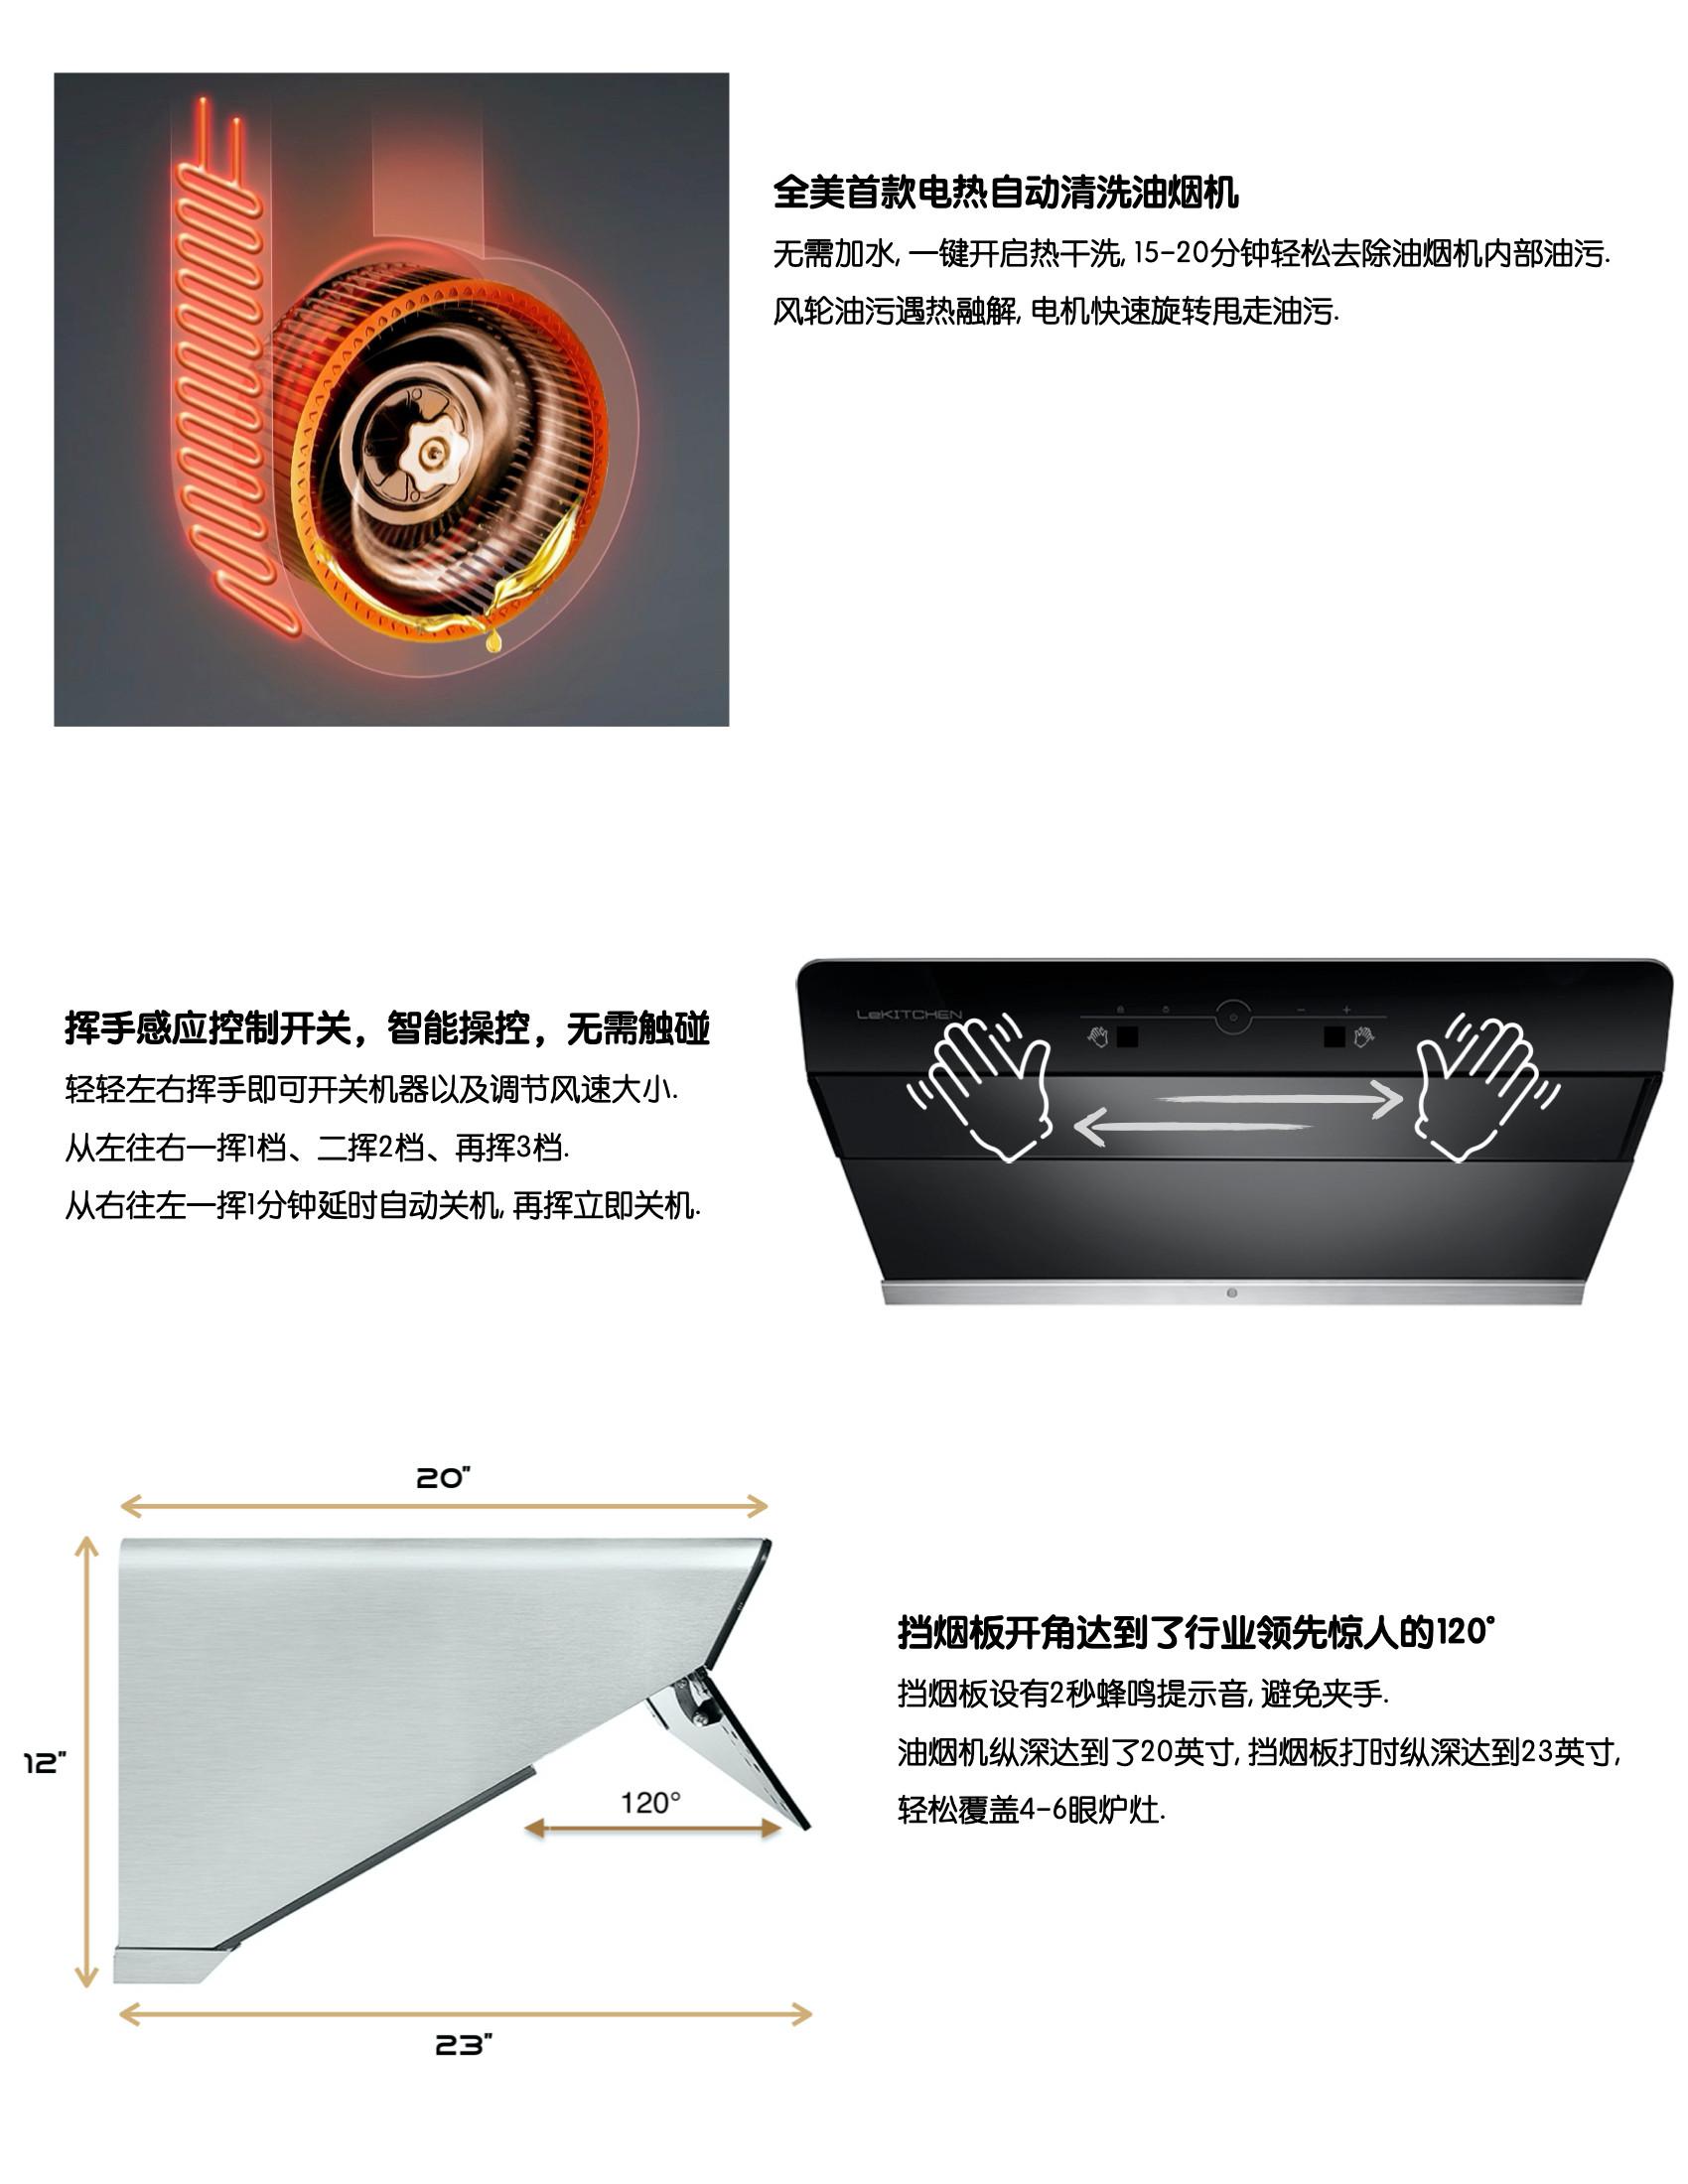 X800网页介绍.jpg